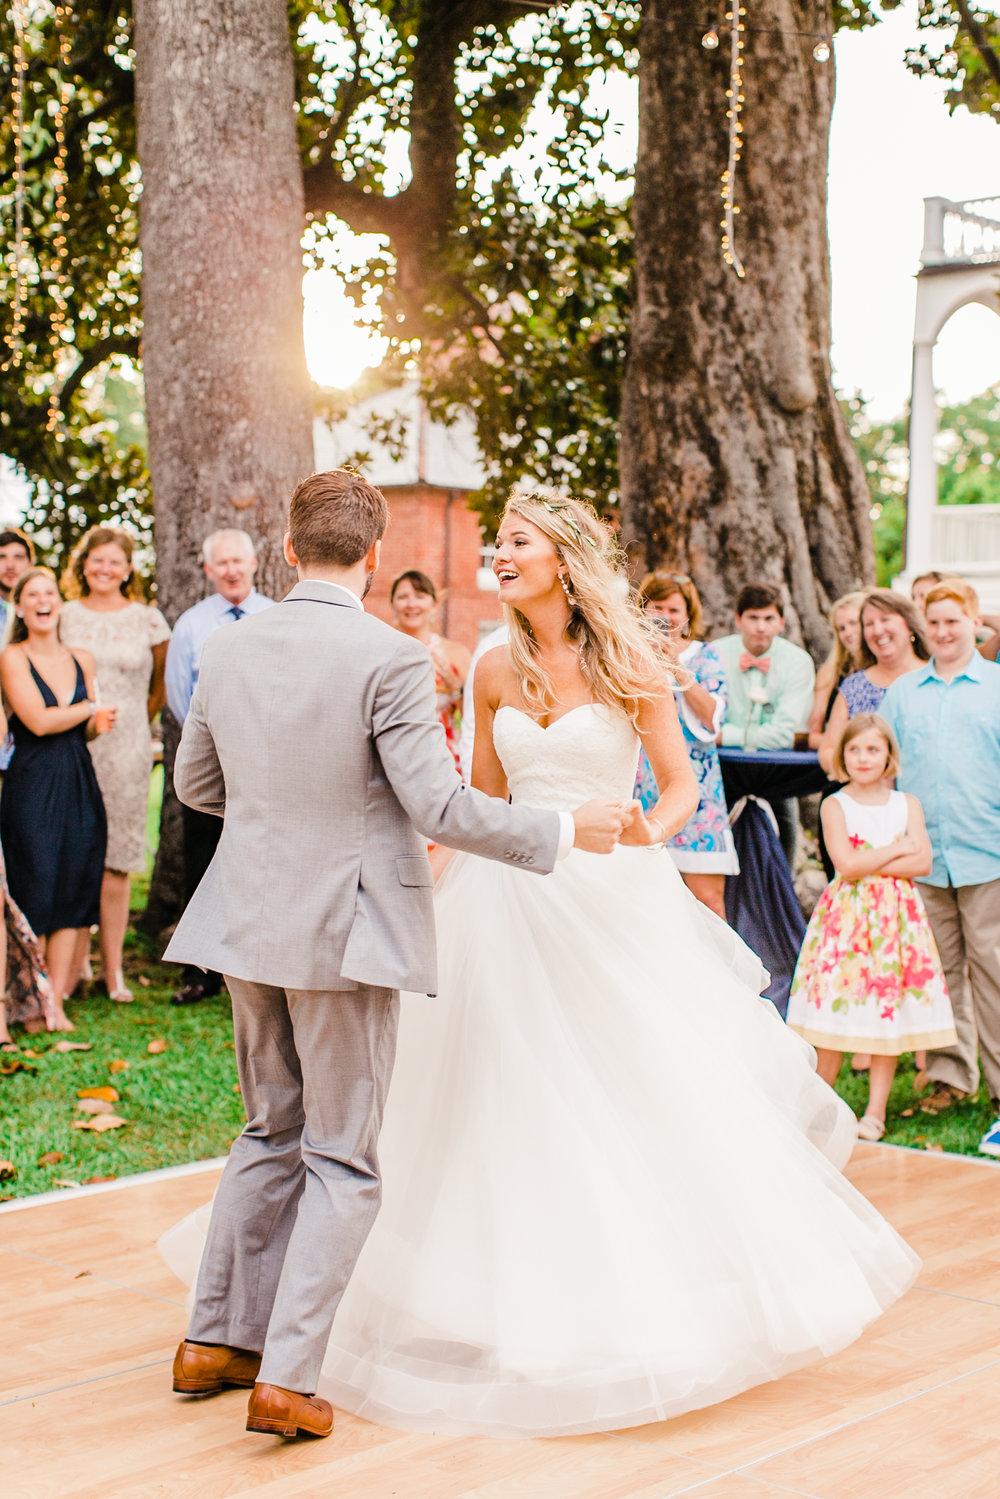 robertmillshousewedding-700.jpg